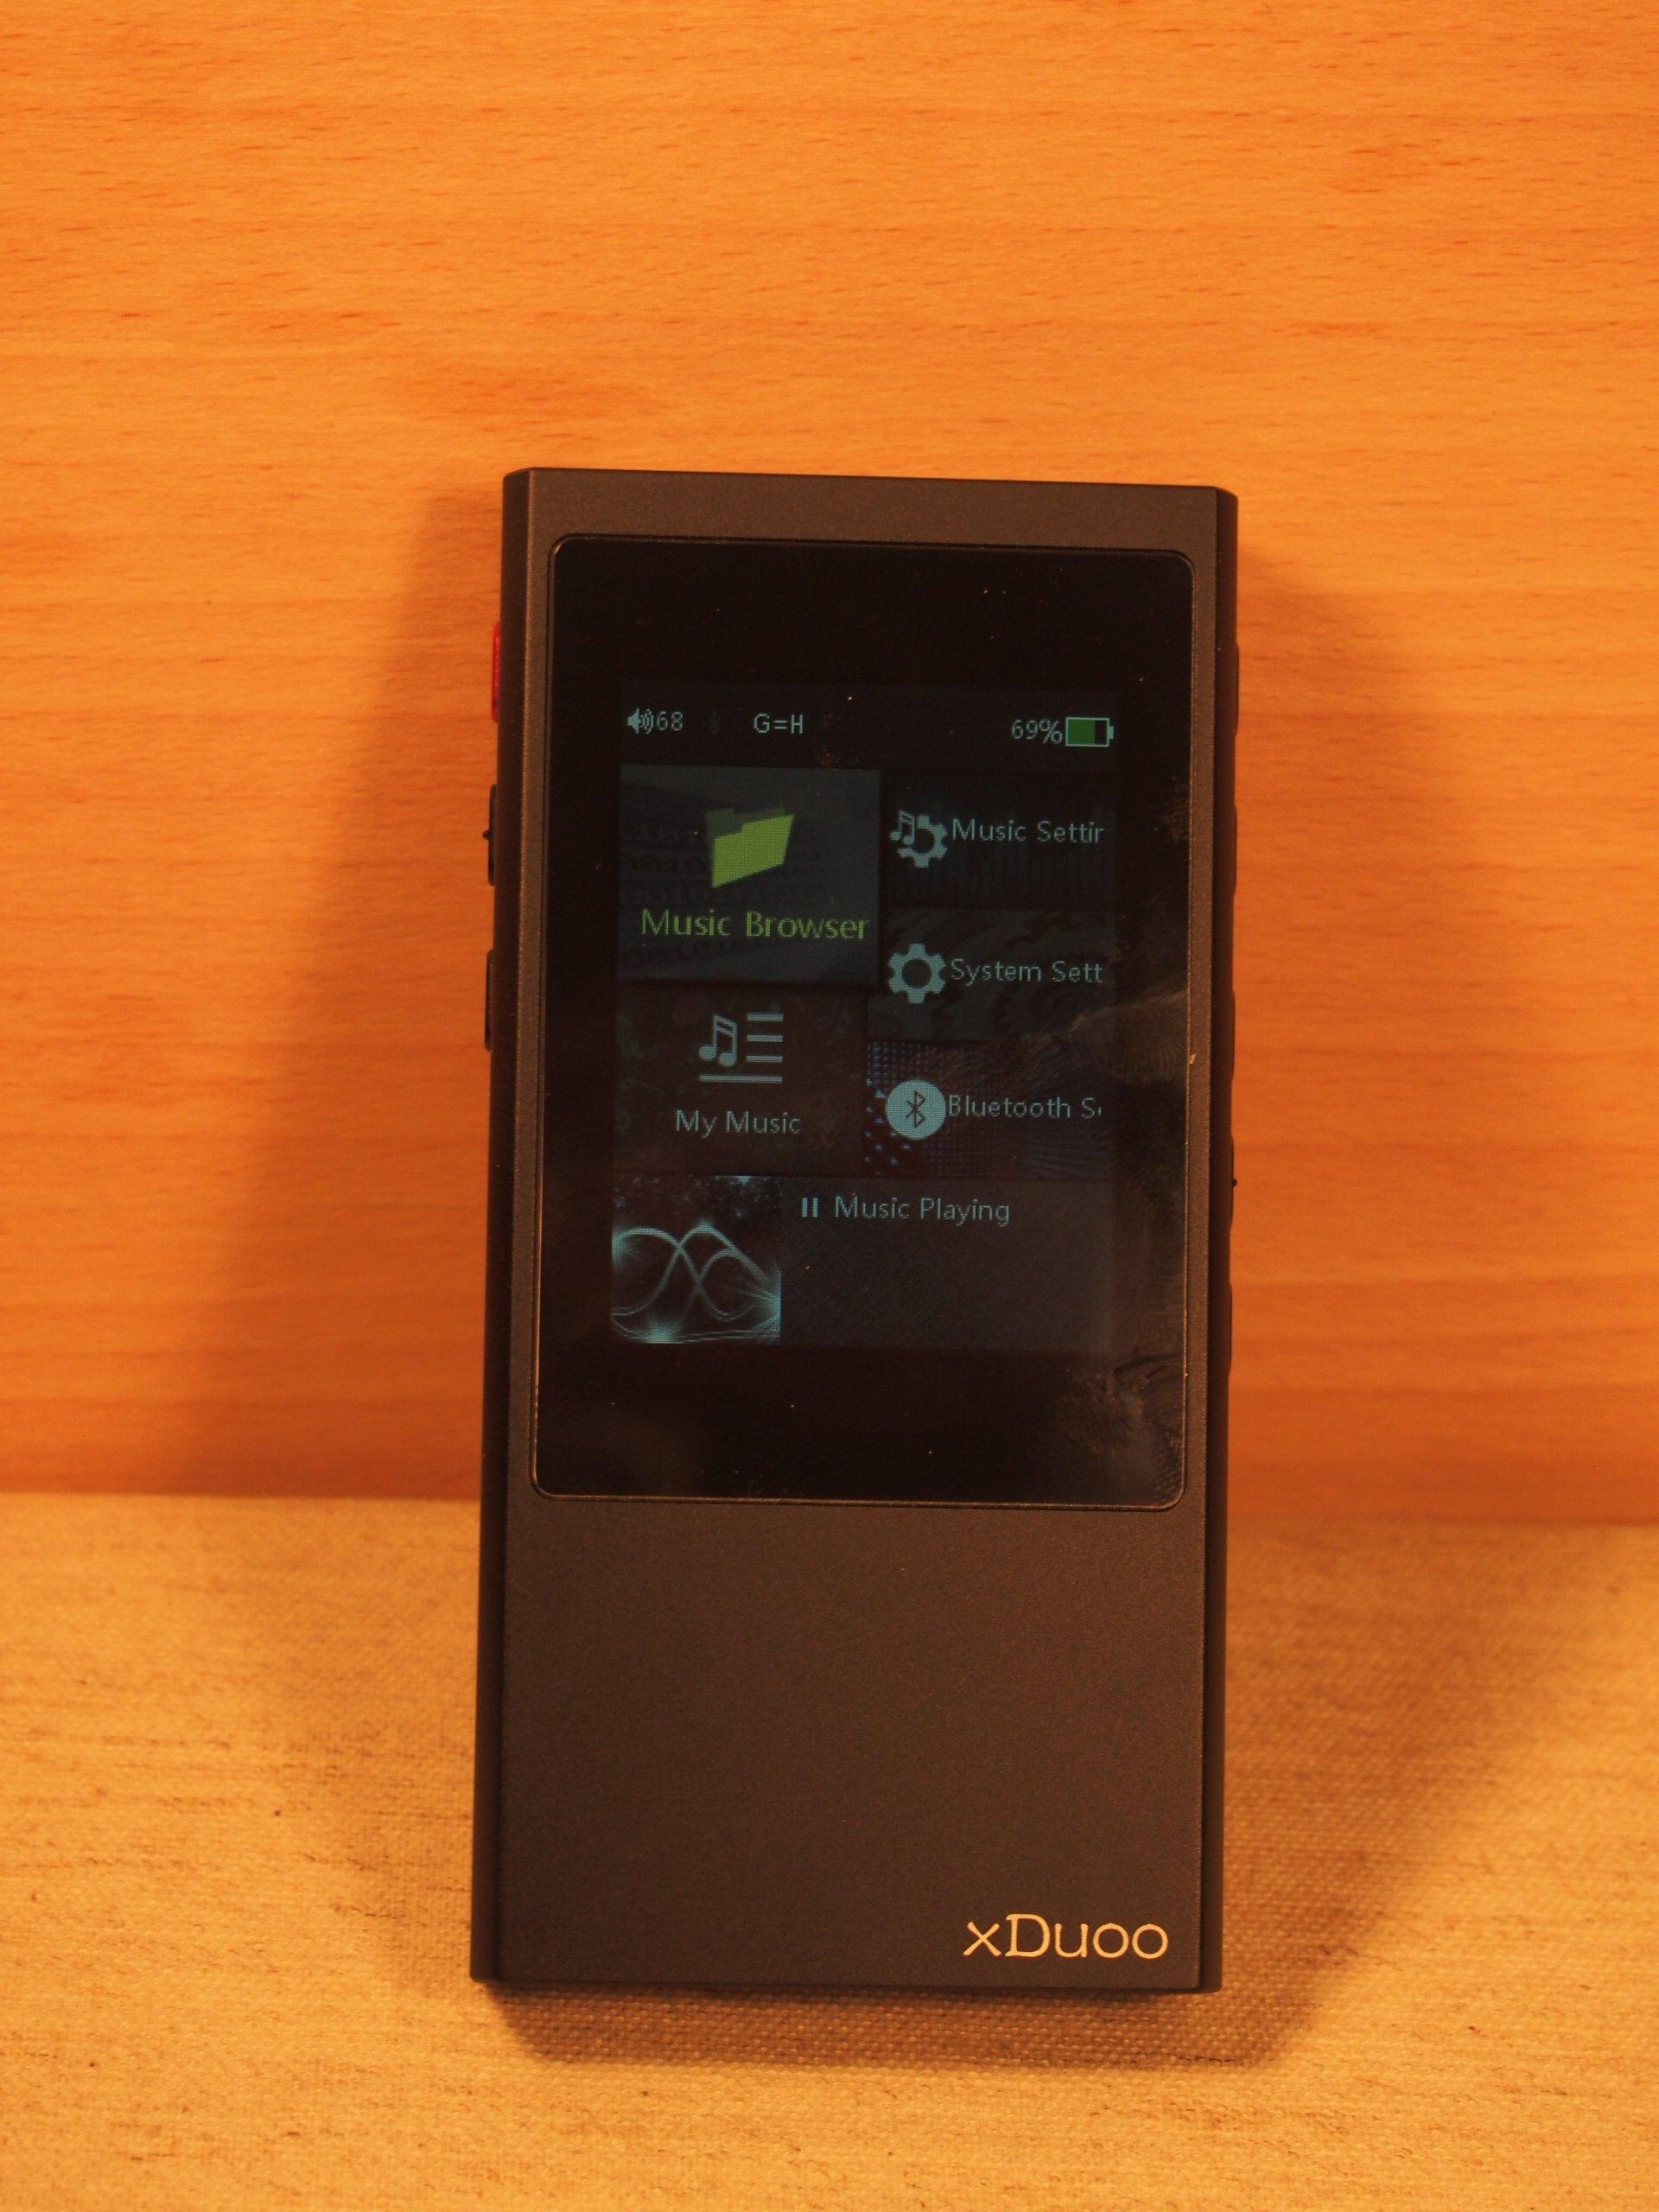 Xduoo X20 High Fidelity Lossless Music Dsd Hifi Mp3 Player Dap Support Apt-x Aptx Bluetooth 4.1 Xduoo X3 X10 Nano D3 Xduoo X3ii Products Hot Sale Hifi Devices